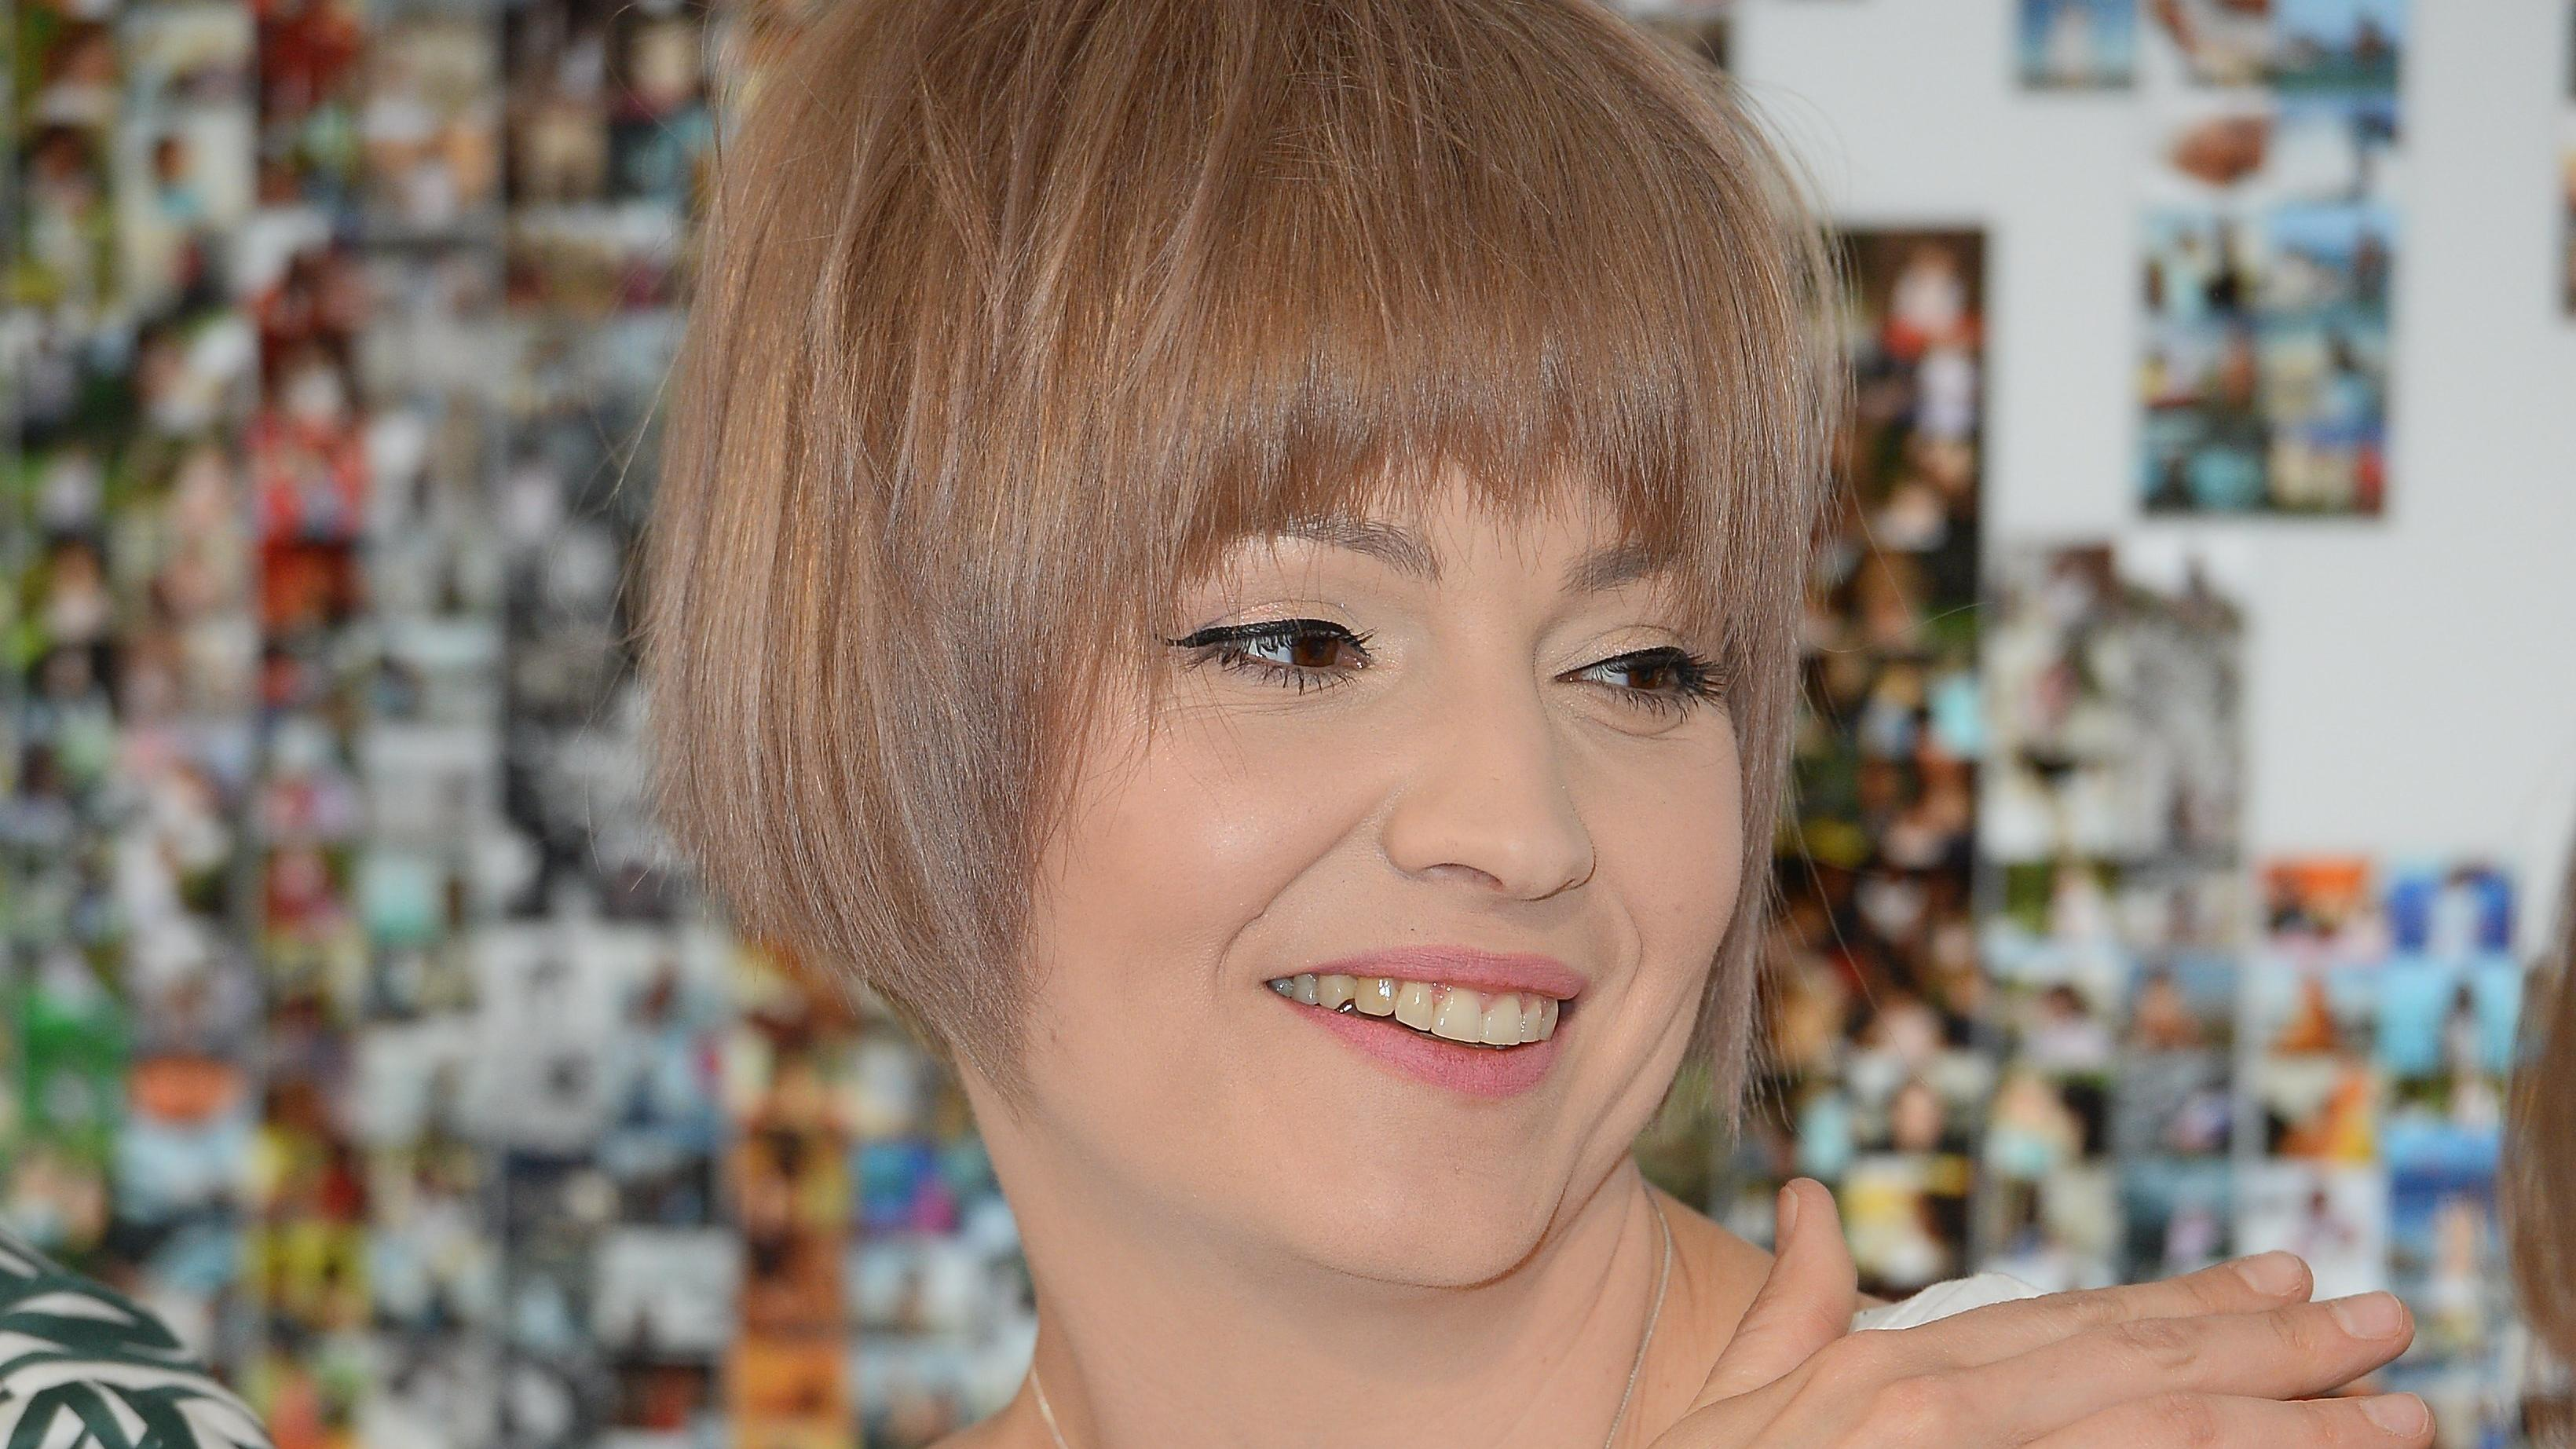 Dorota Szelągowska I Jej Nowa Fryzura Na Konferencji Hgtv